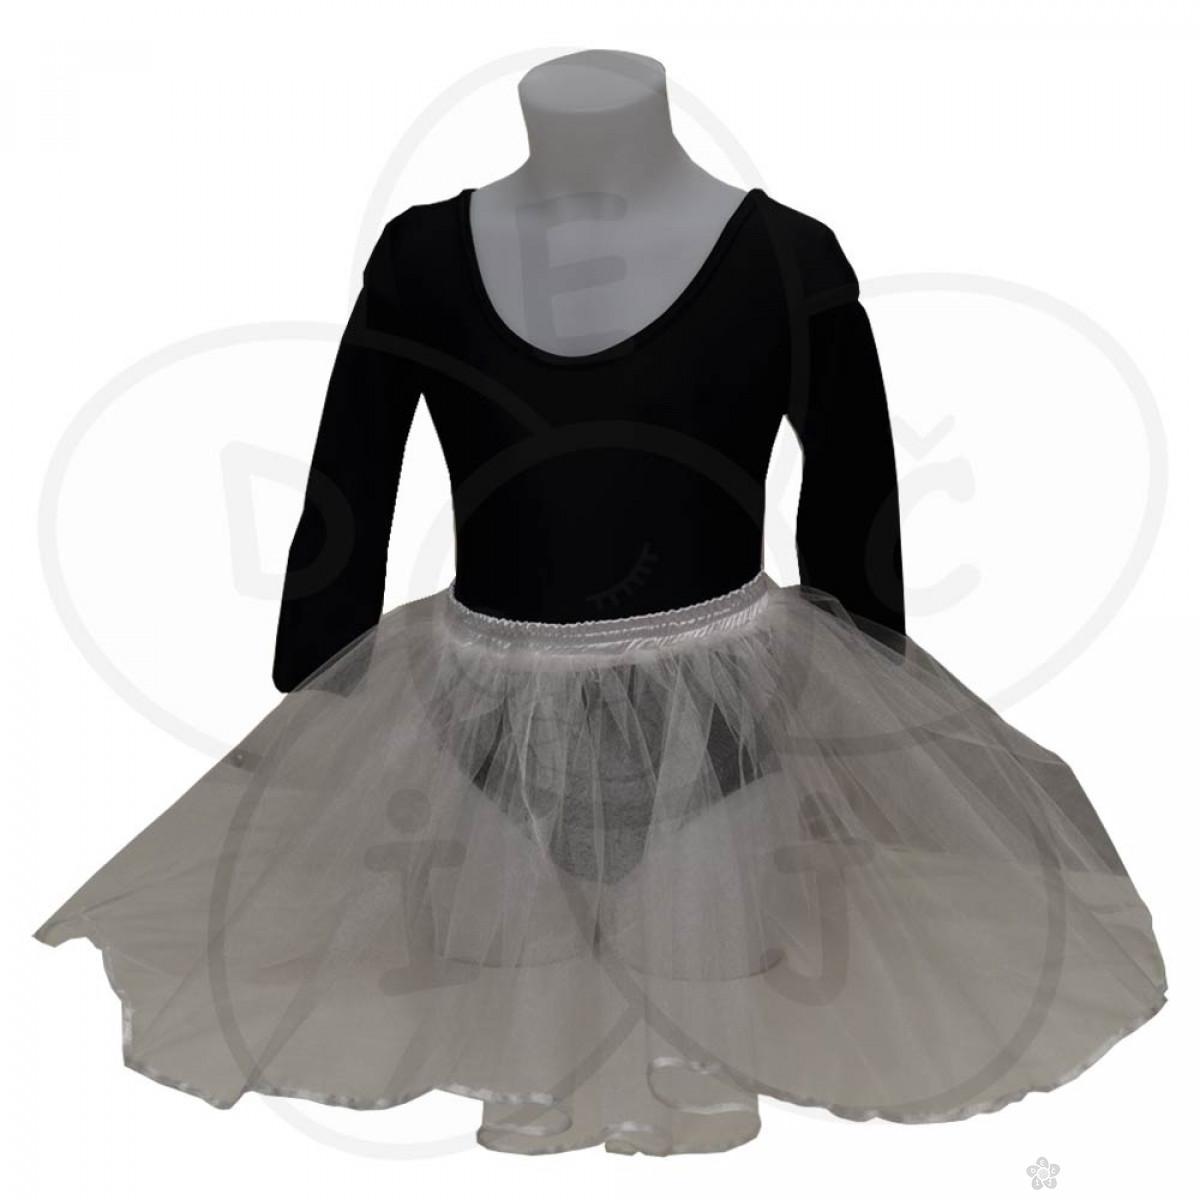 Baletska suknjica, bela